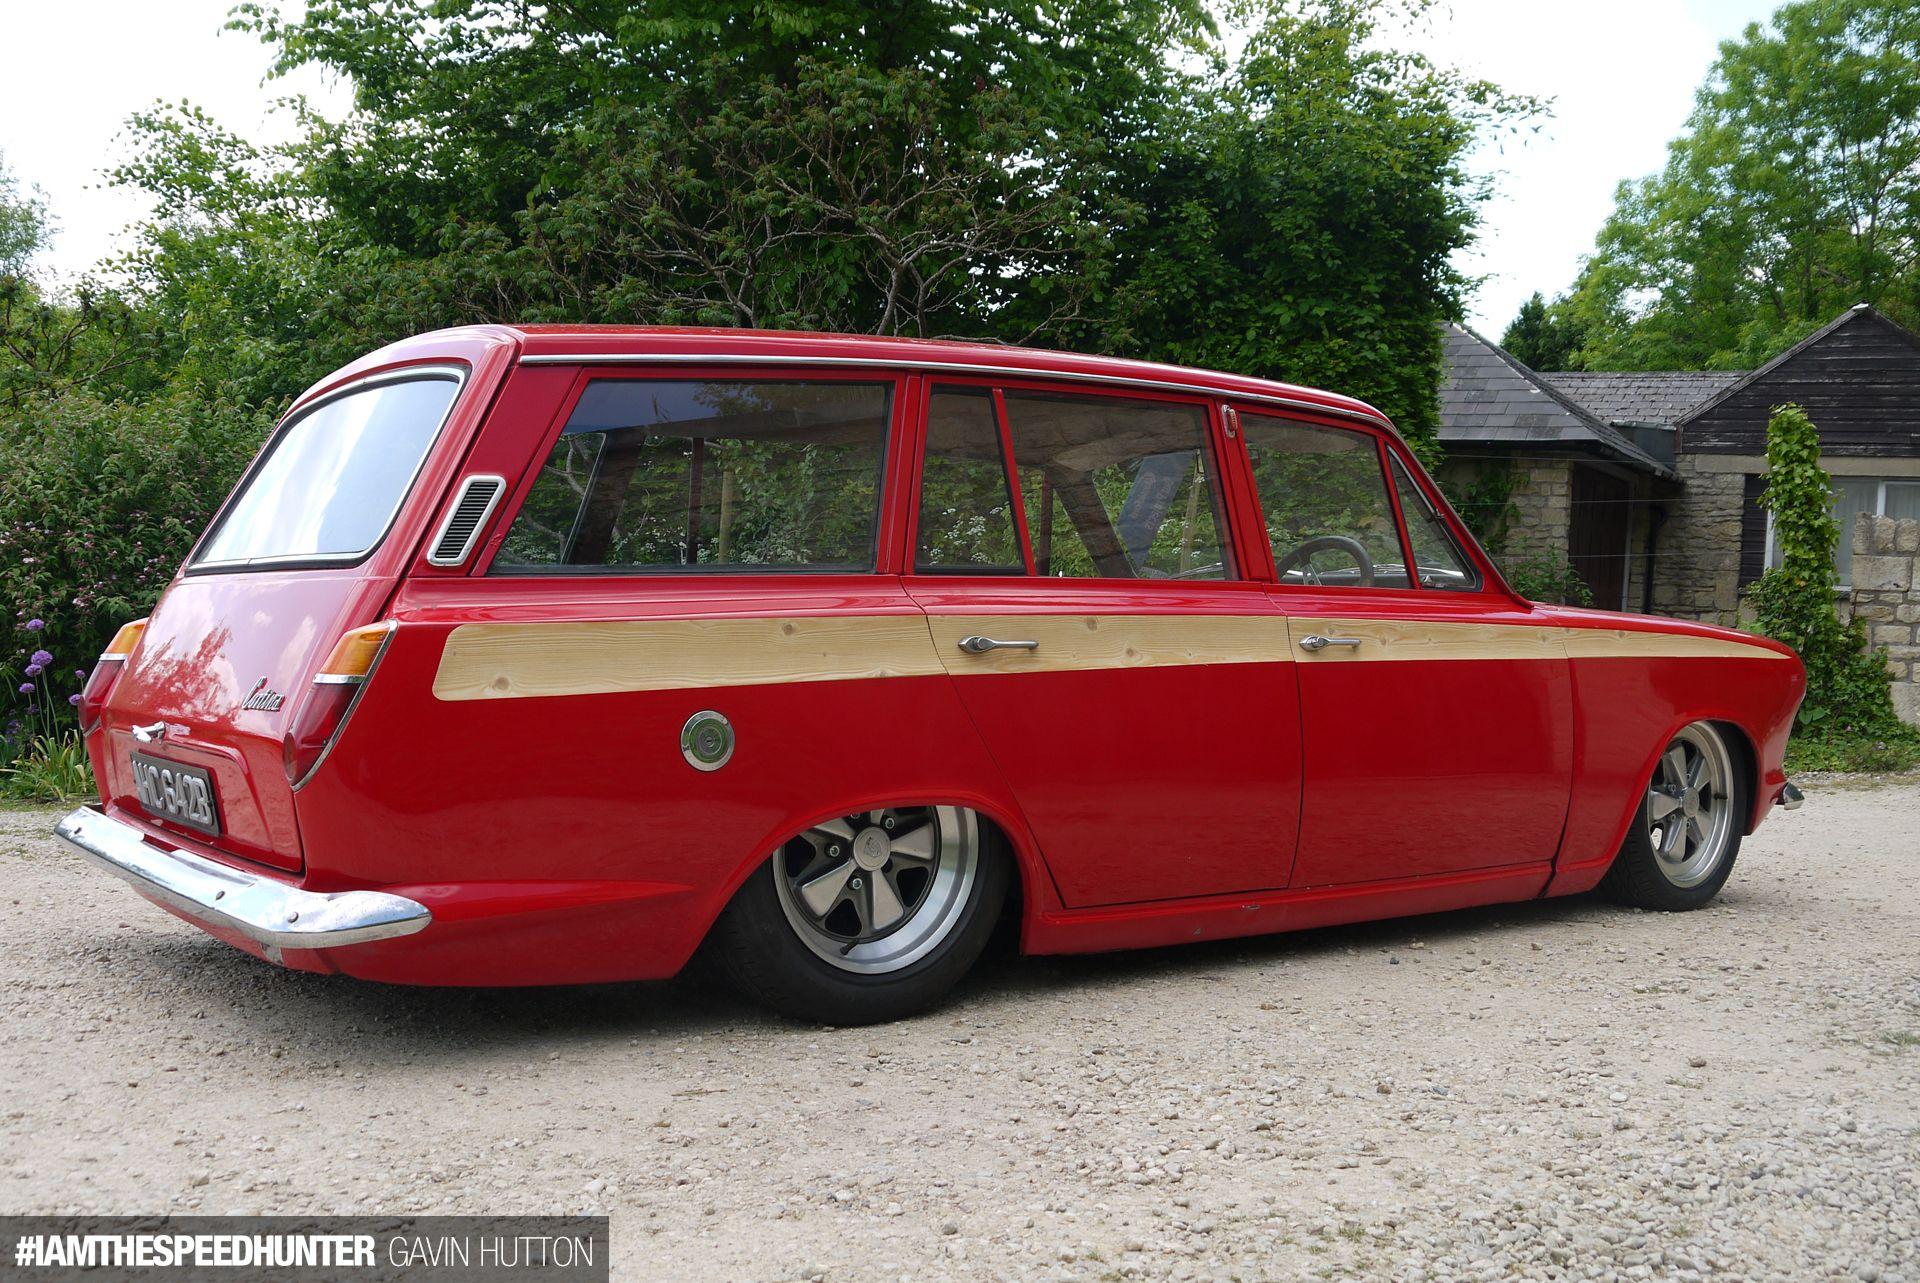 Iamthespeedhunter Wagon Lovin Classic Cars Vintage Classic